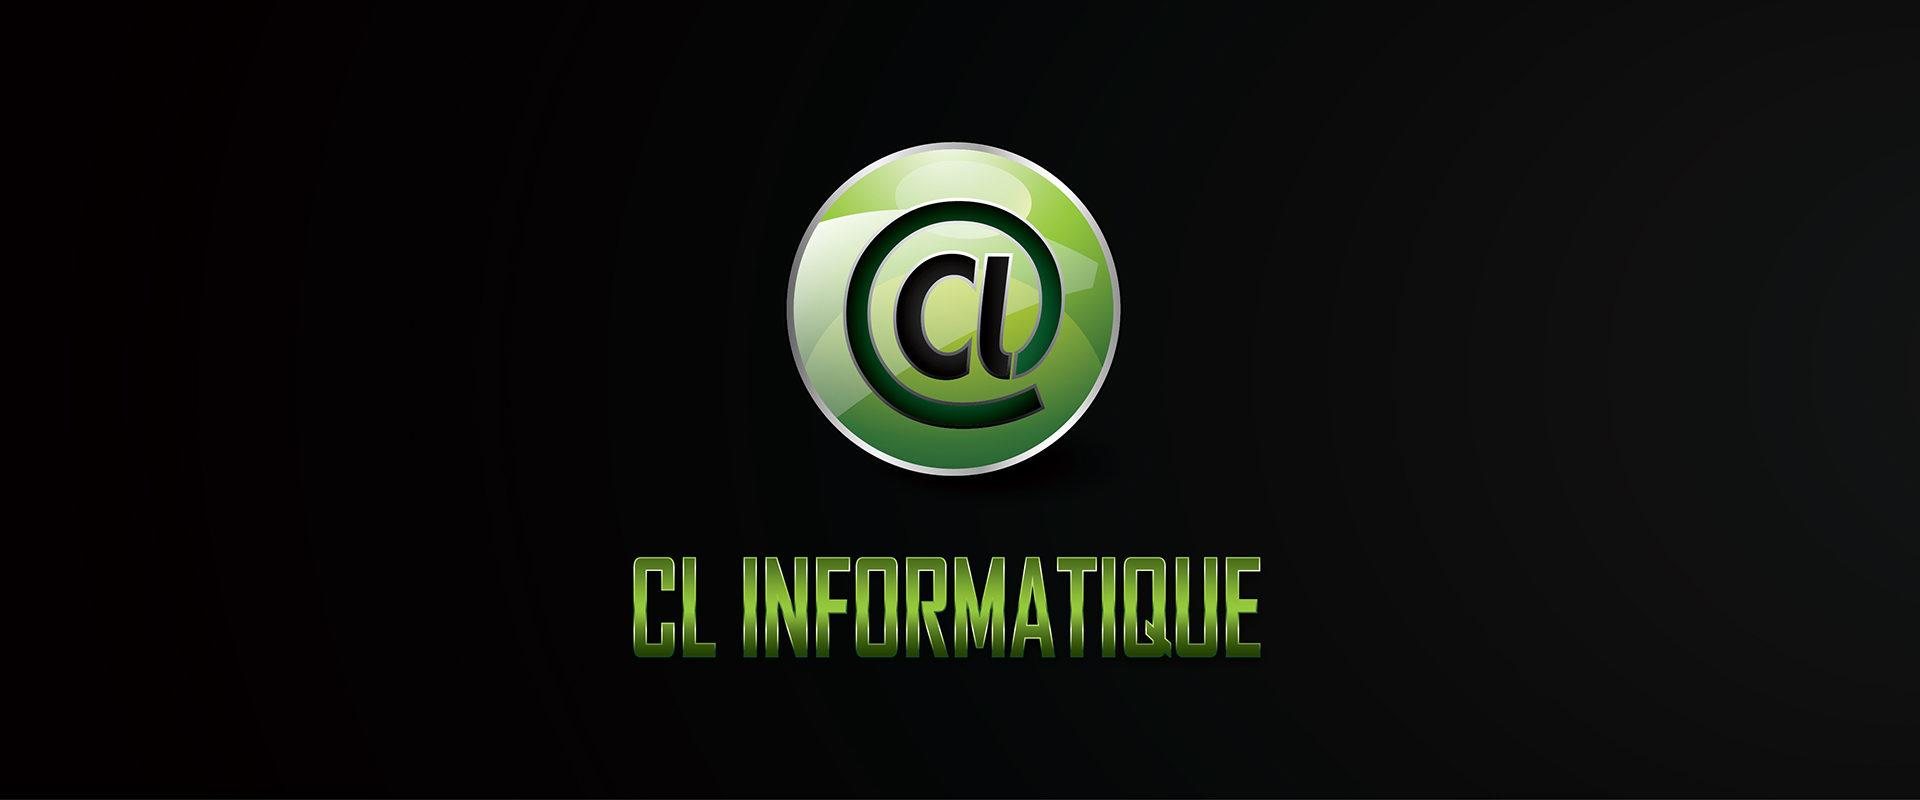 LOGO-CL INFORMATIQUE